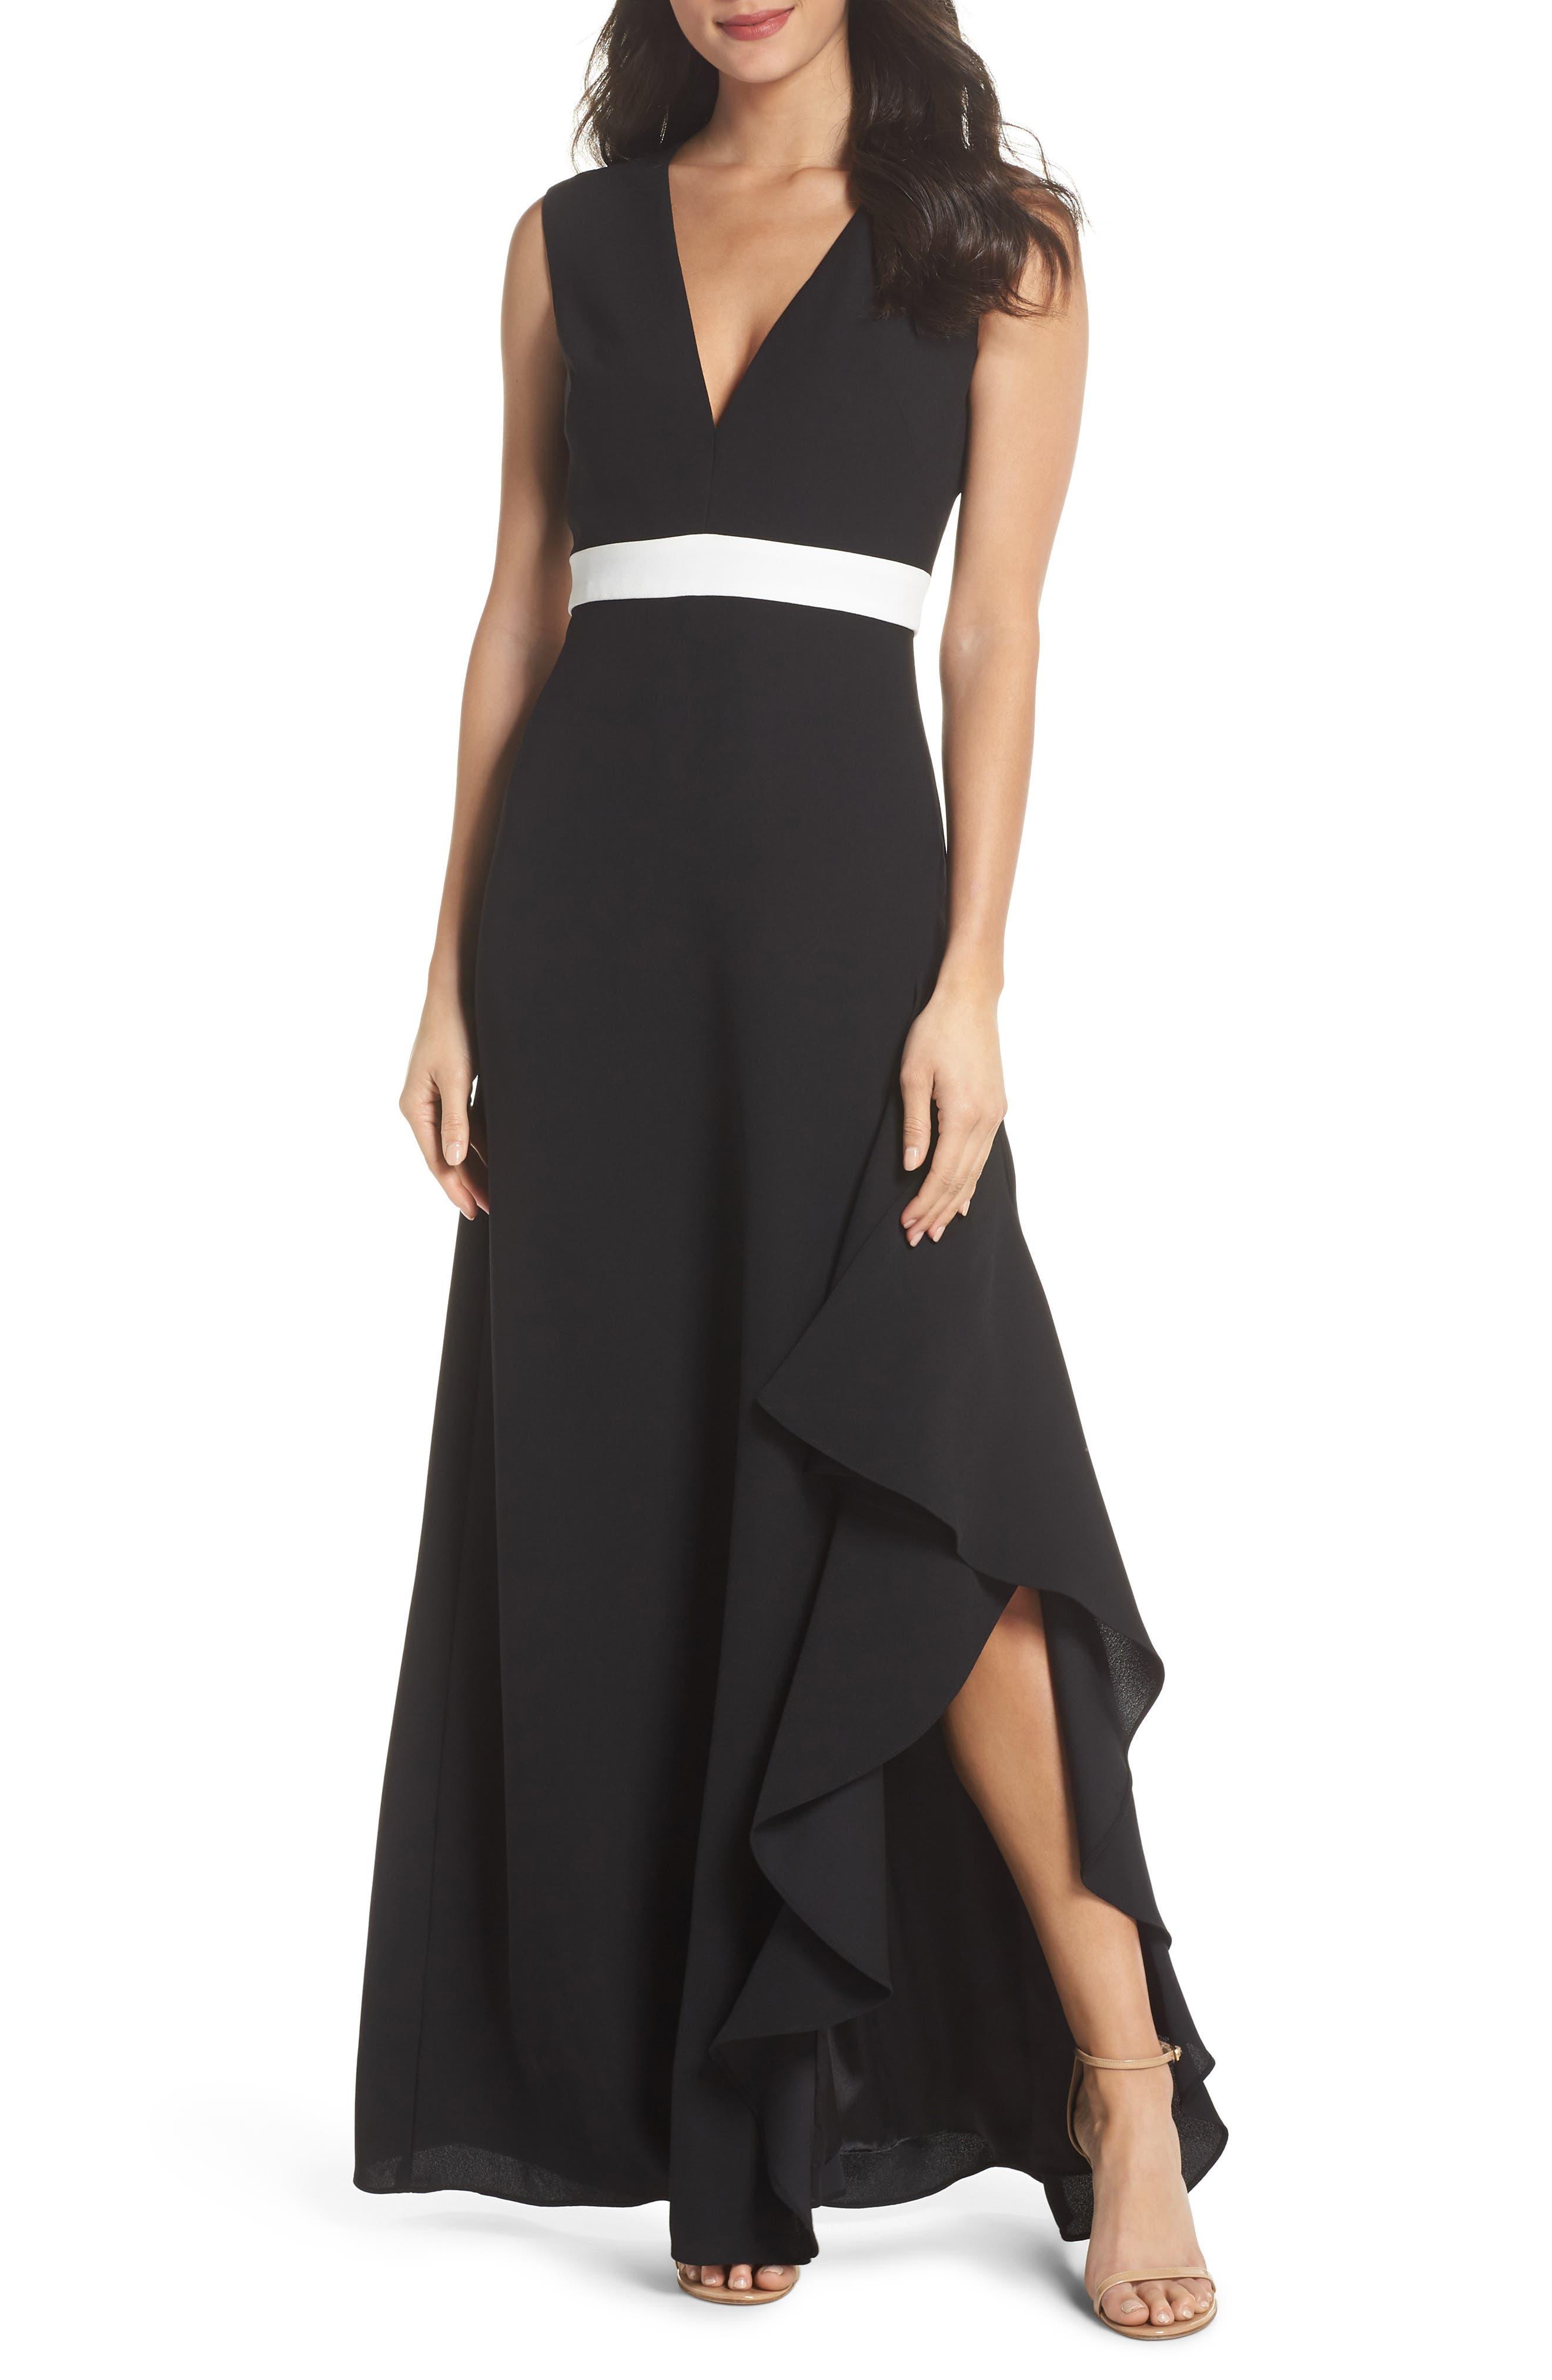 ML Monique Lhullier Sleeveless Crepe Gown,                         Main,                         color, Black/ White